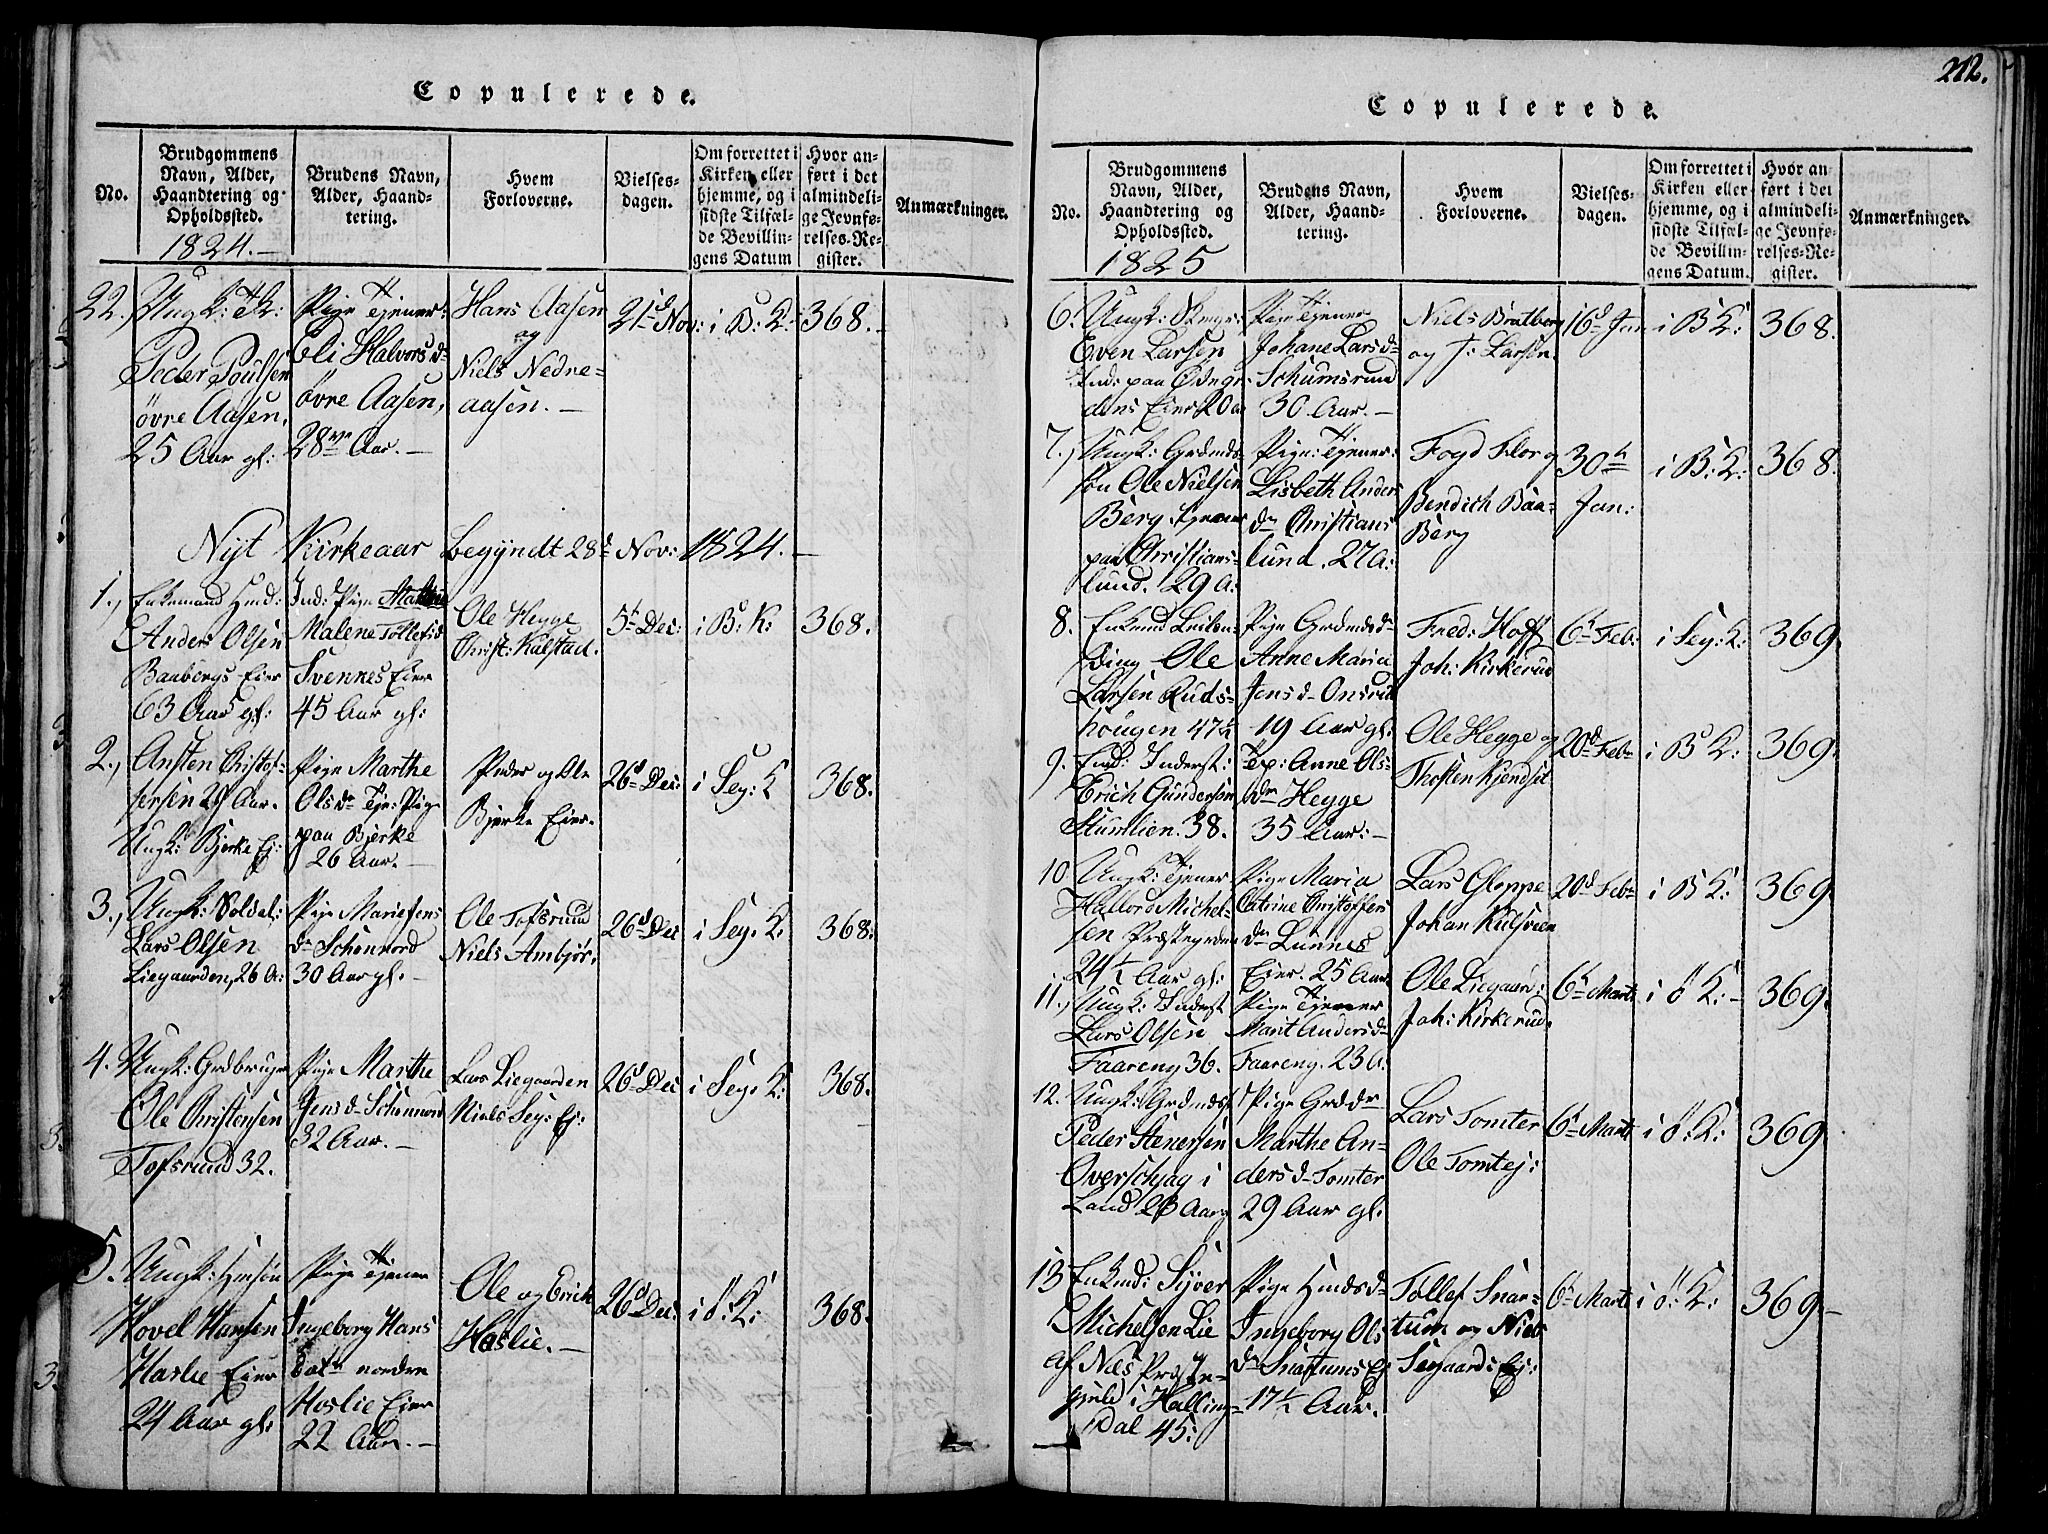 SAH, Biri prestekontor, Ministerialbok nr. 3, 1814-1828, s. 212